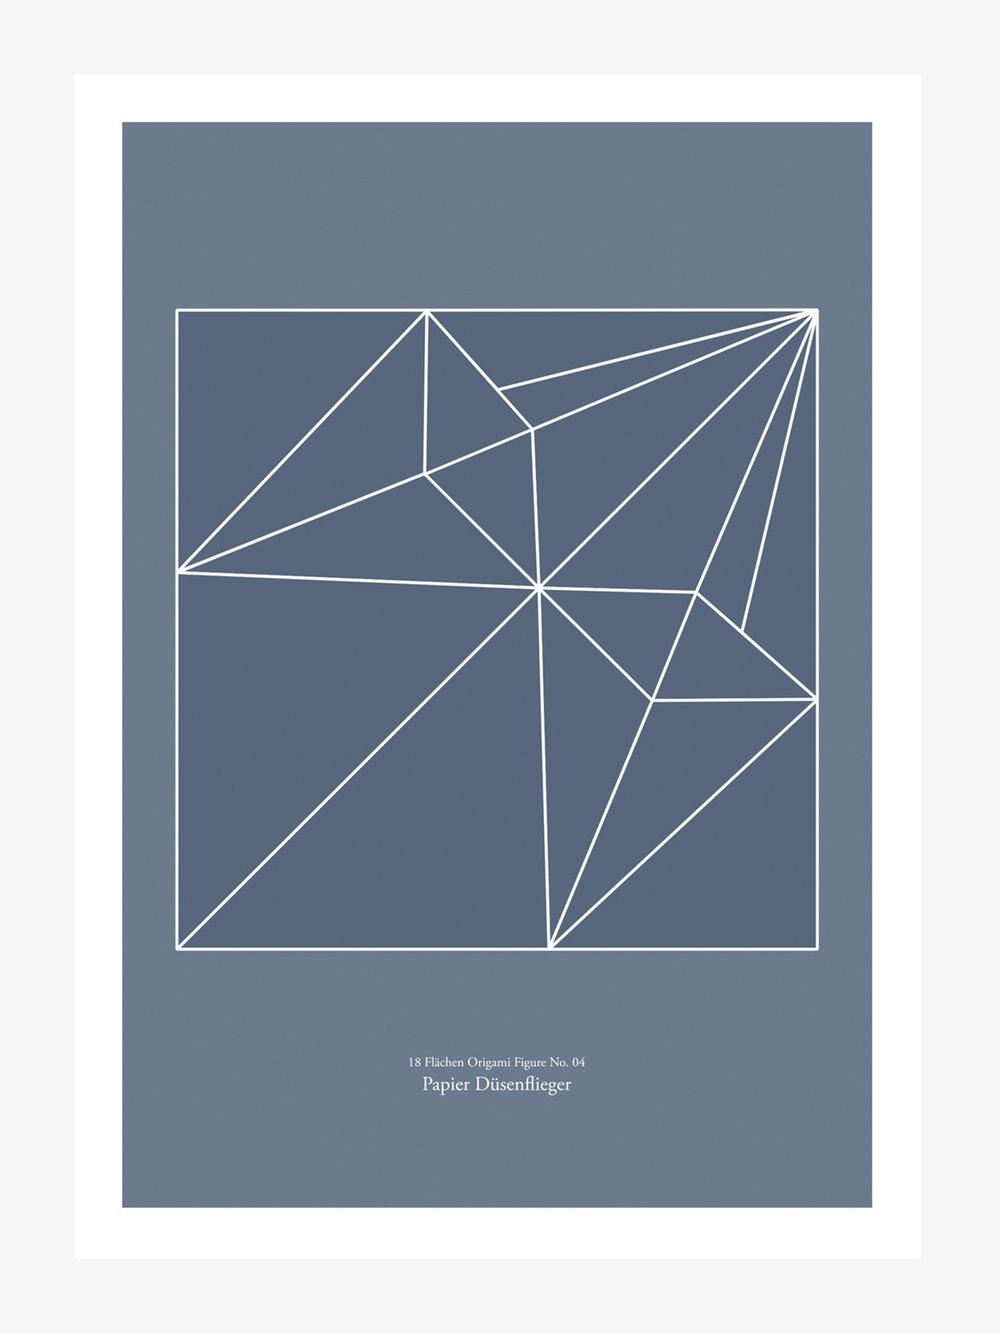 Origami Print Papierdüsenflieger  Origami print Paperjet